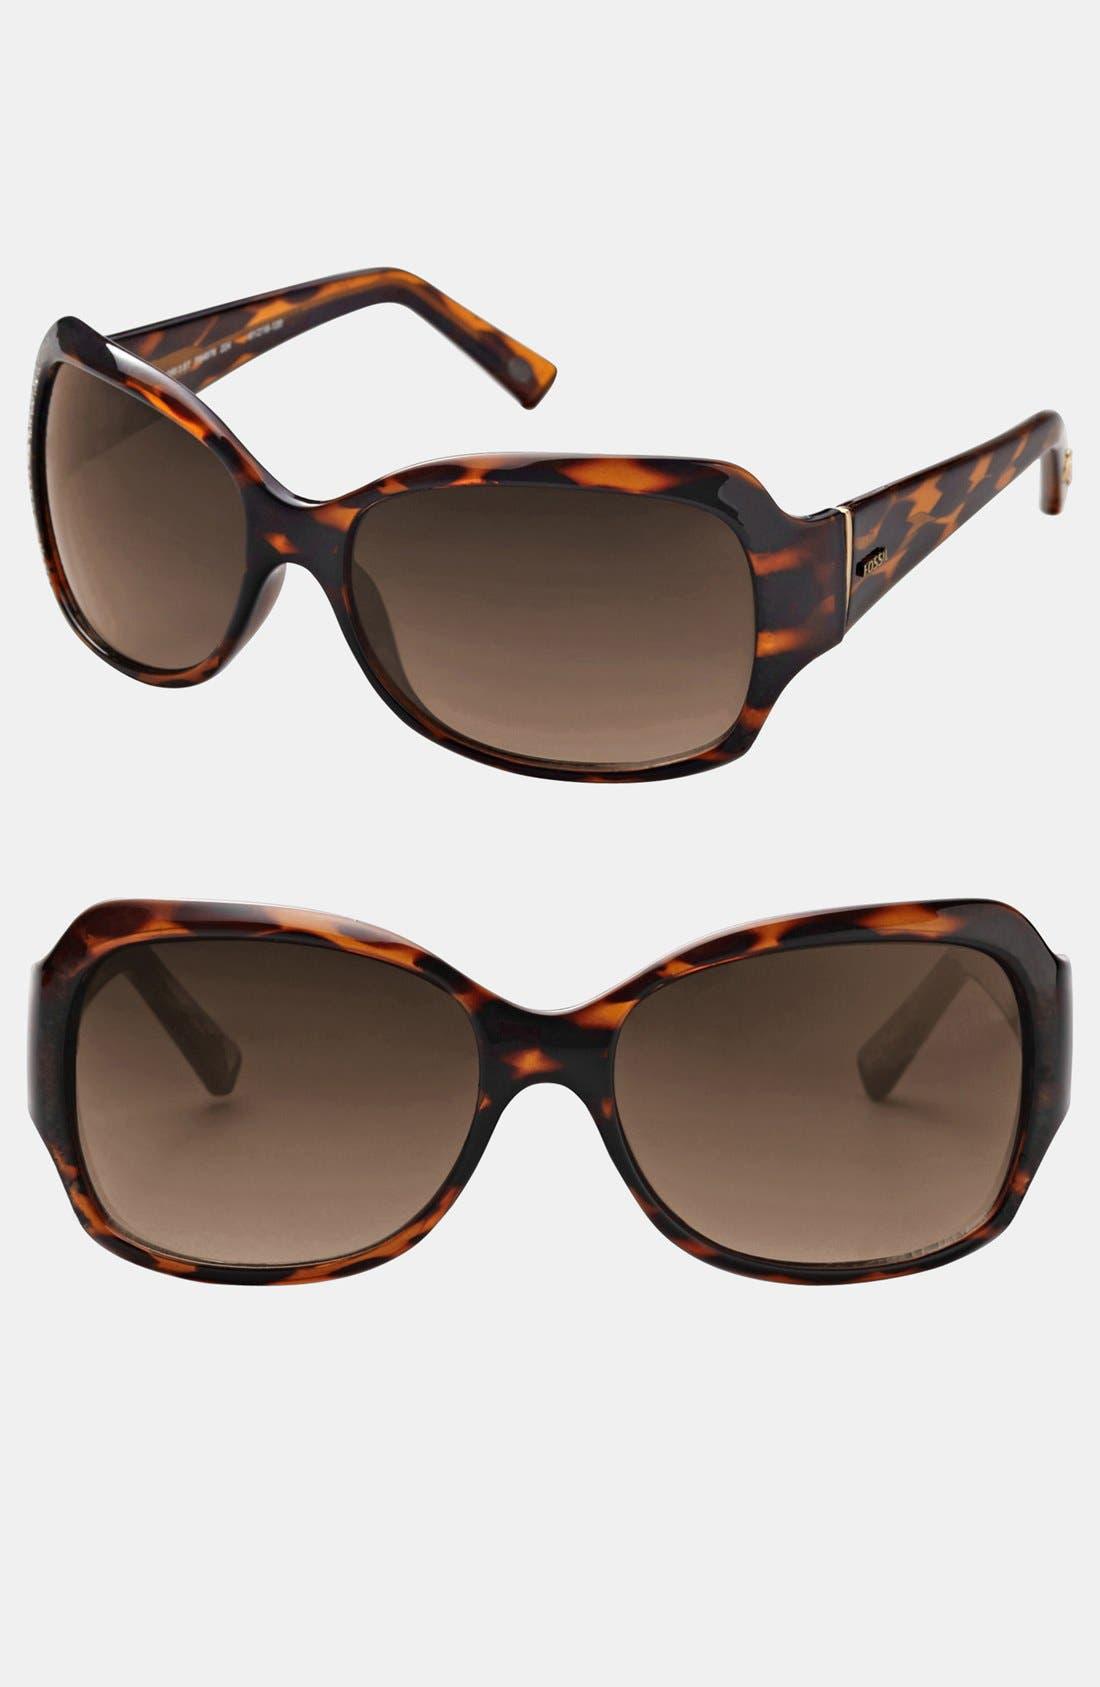 Main Image - Fossil 'Lori 3' 61mm Sunglasses